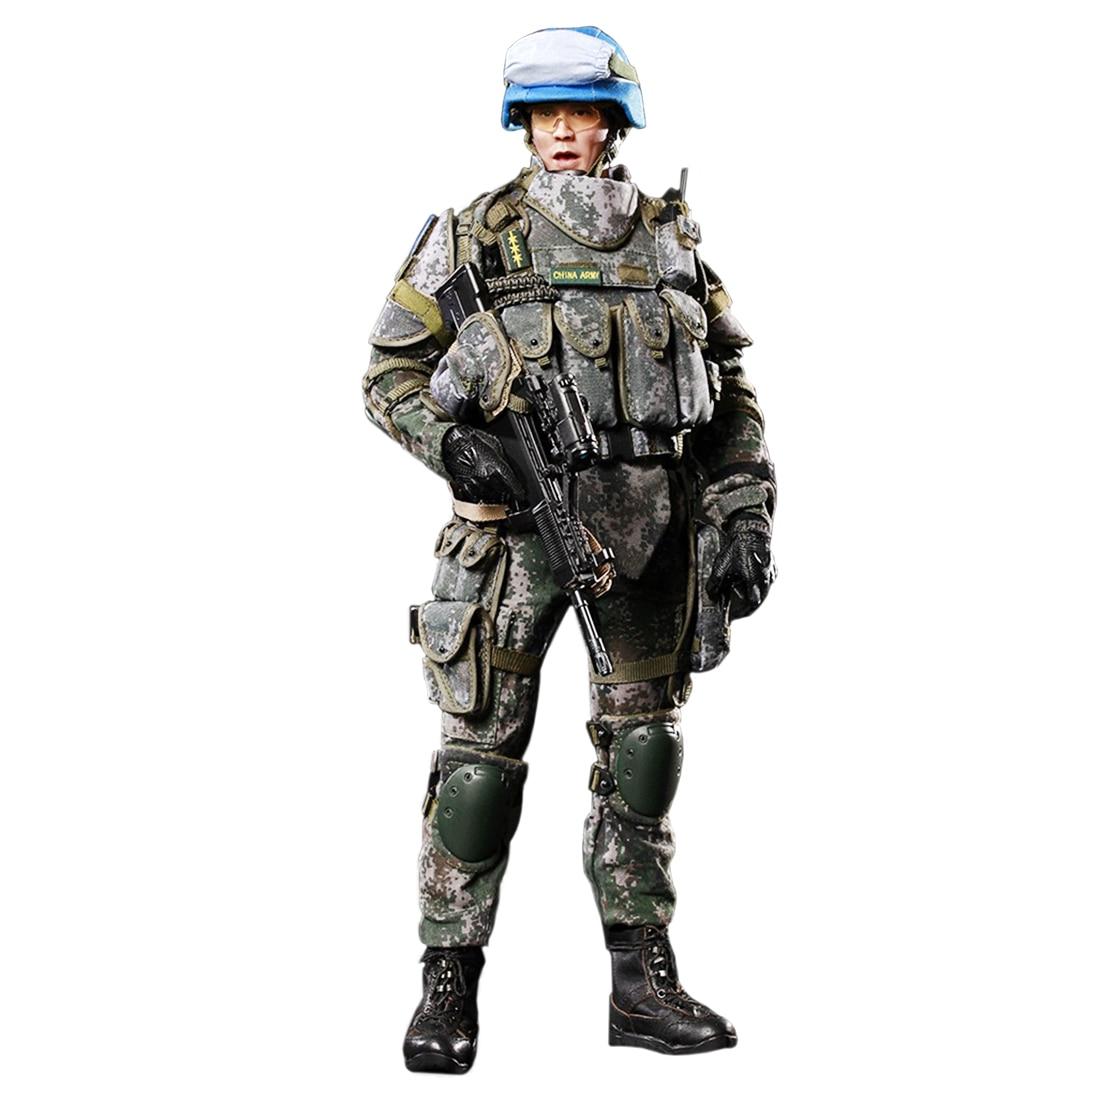 30cm 1/6 Movable Figure Military Soldier Model Blue Helmet Warriors30cm 1/6 Movable Figure Military Soldier Model Blue Helmet Warriors